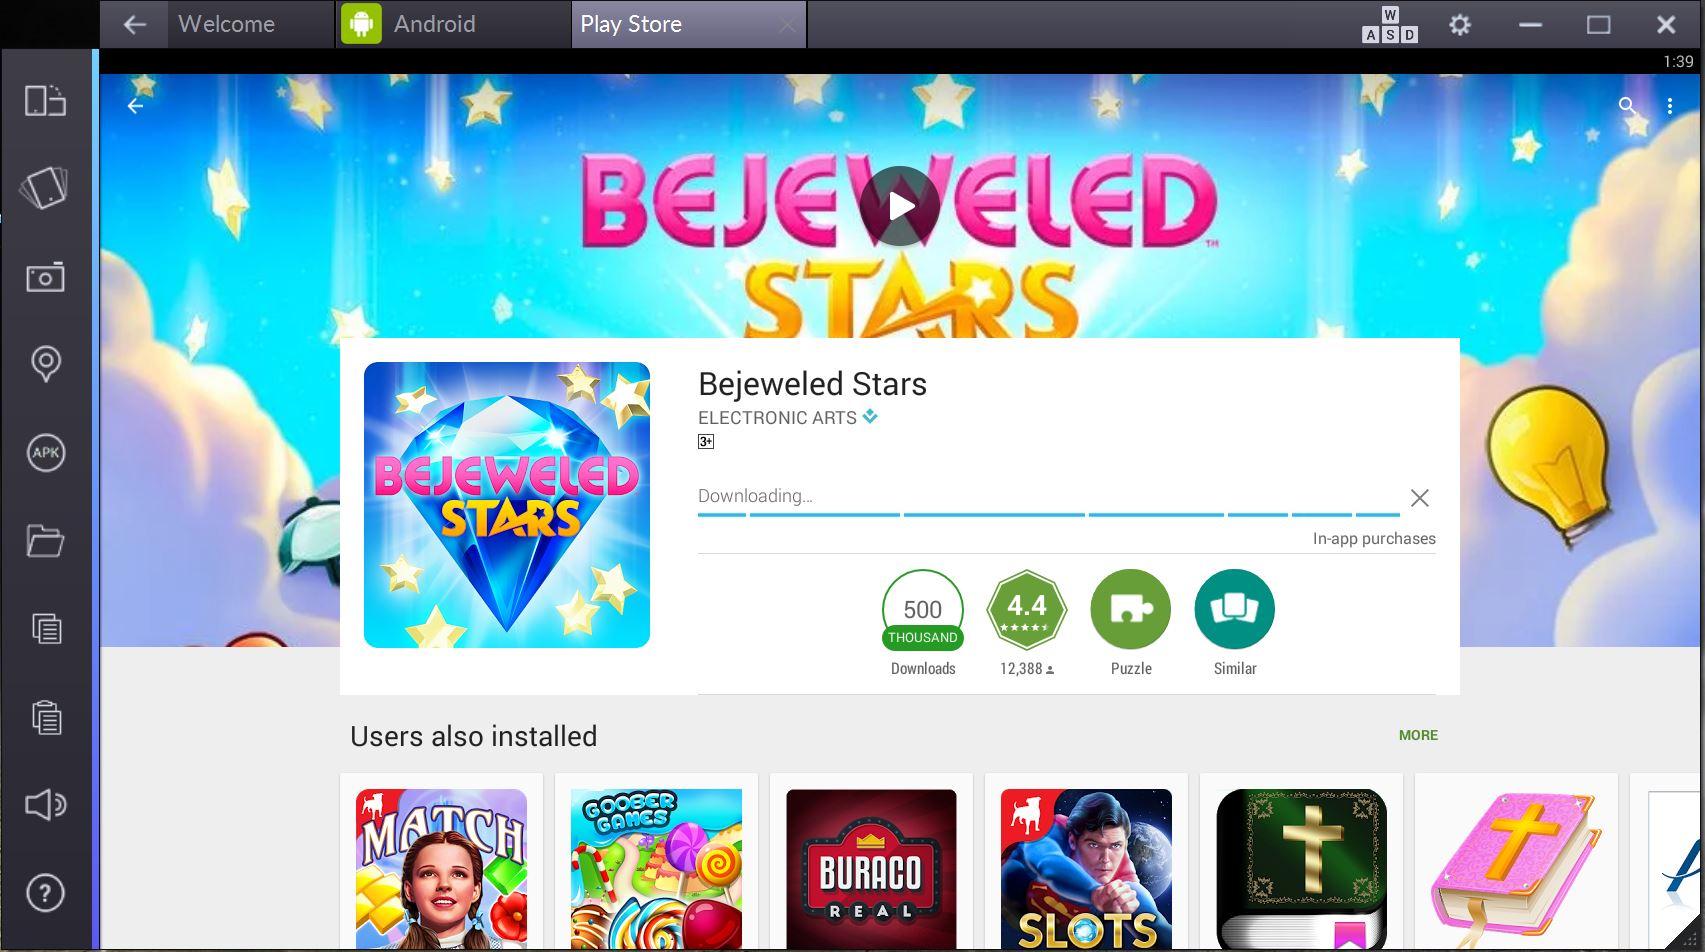 bejeweled stars pc computer free